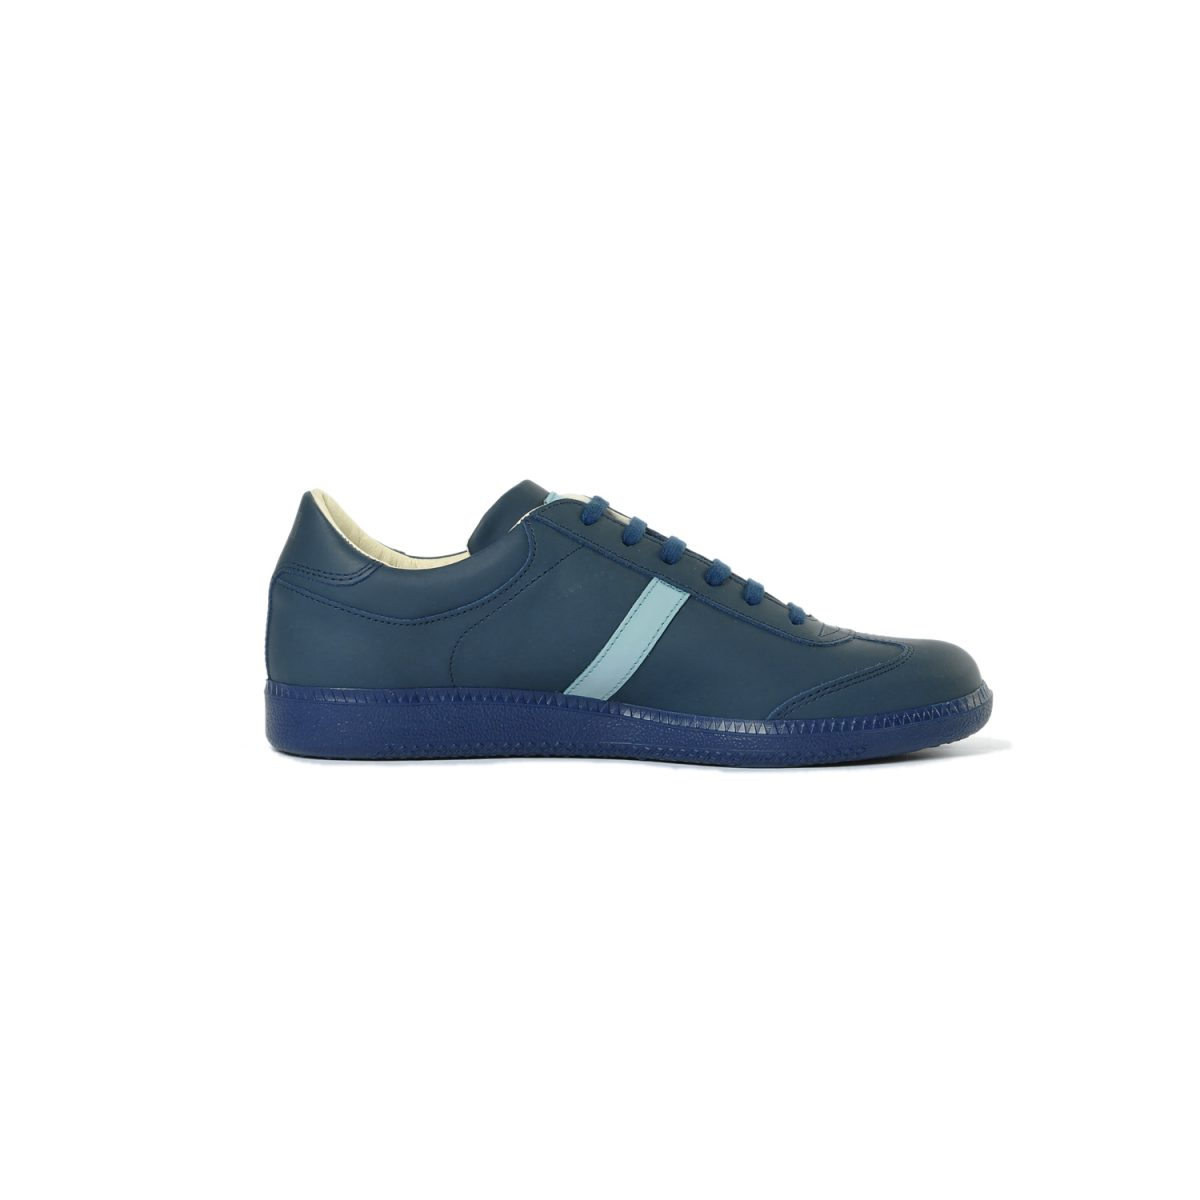 Tisza shoes - Compakt - Ocean